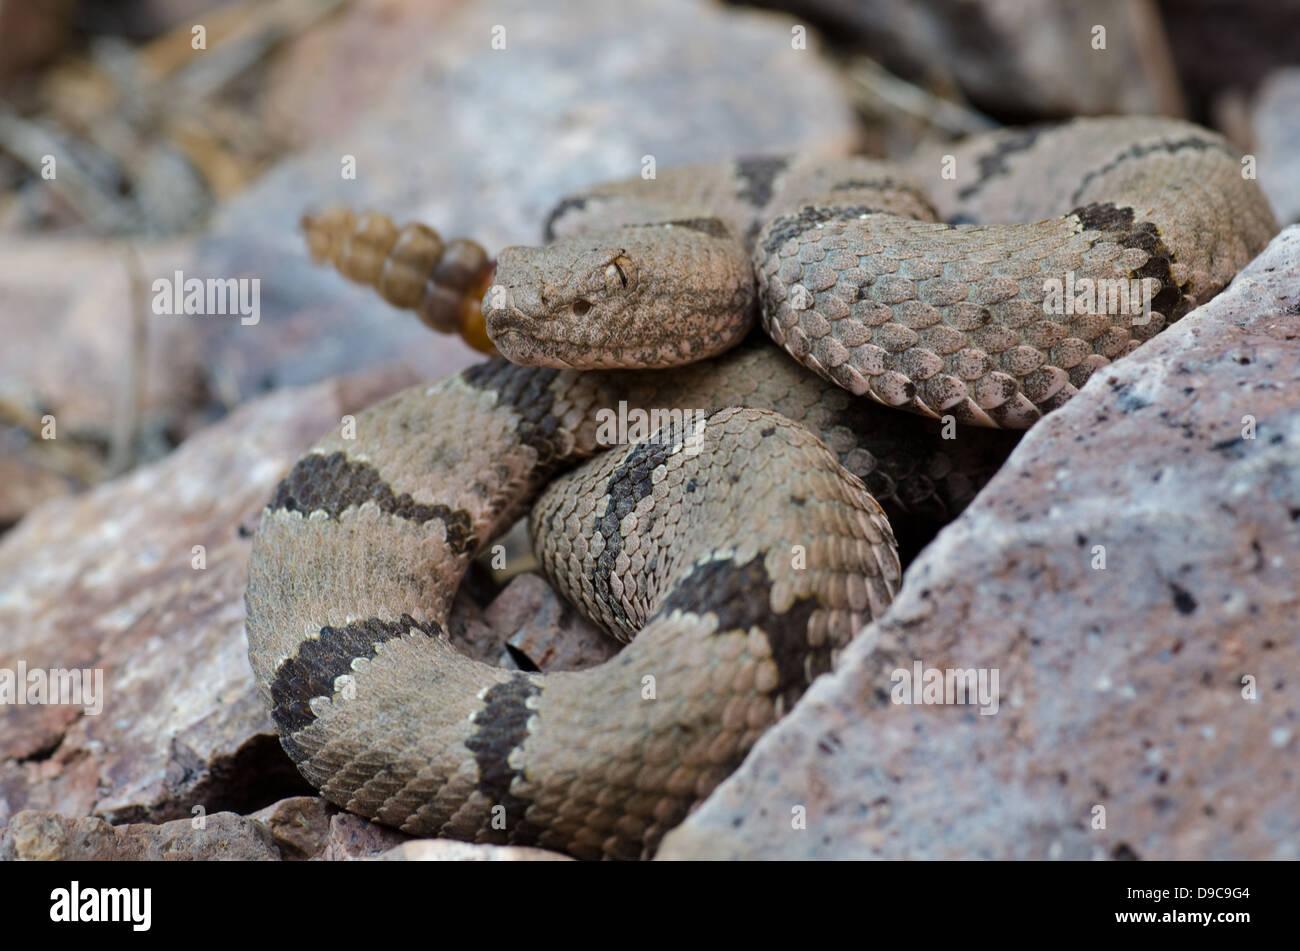 New mexico socorro county magdalena - Banded Rock Rattlesnake Crotalus Lepidus Klauberi Magdalena Mountains Socorro Co New Mexico Usa